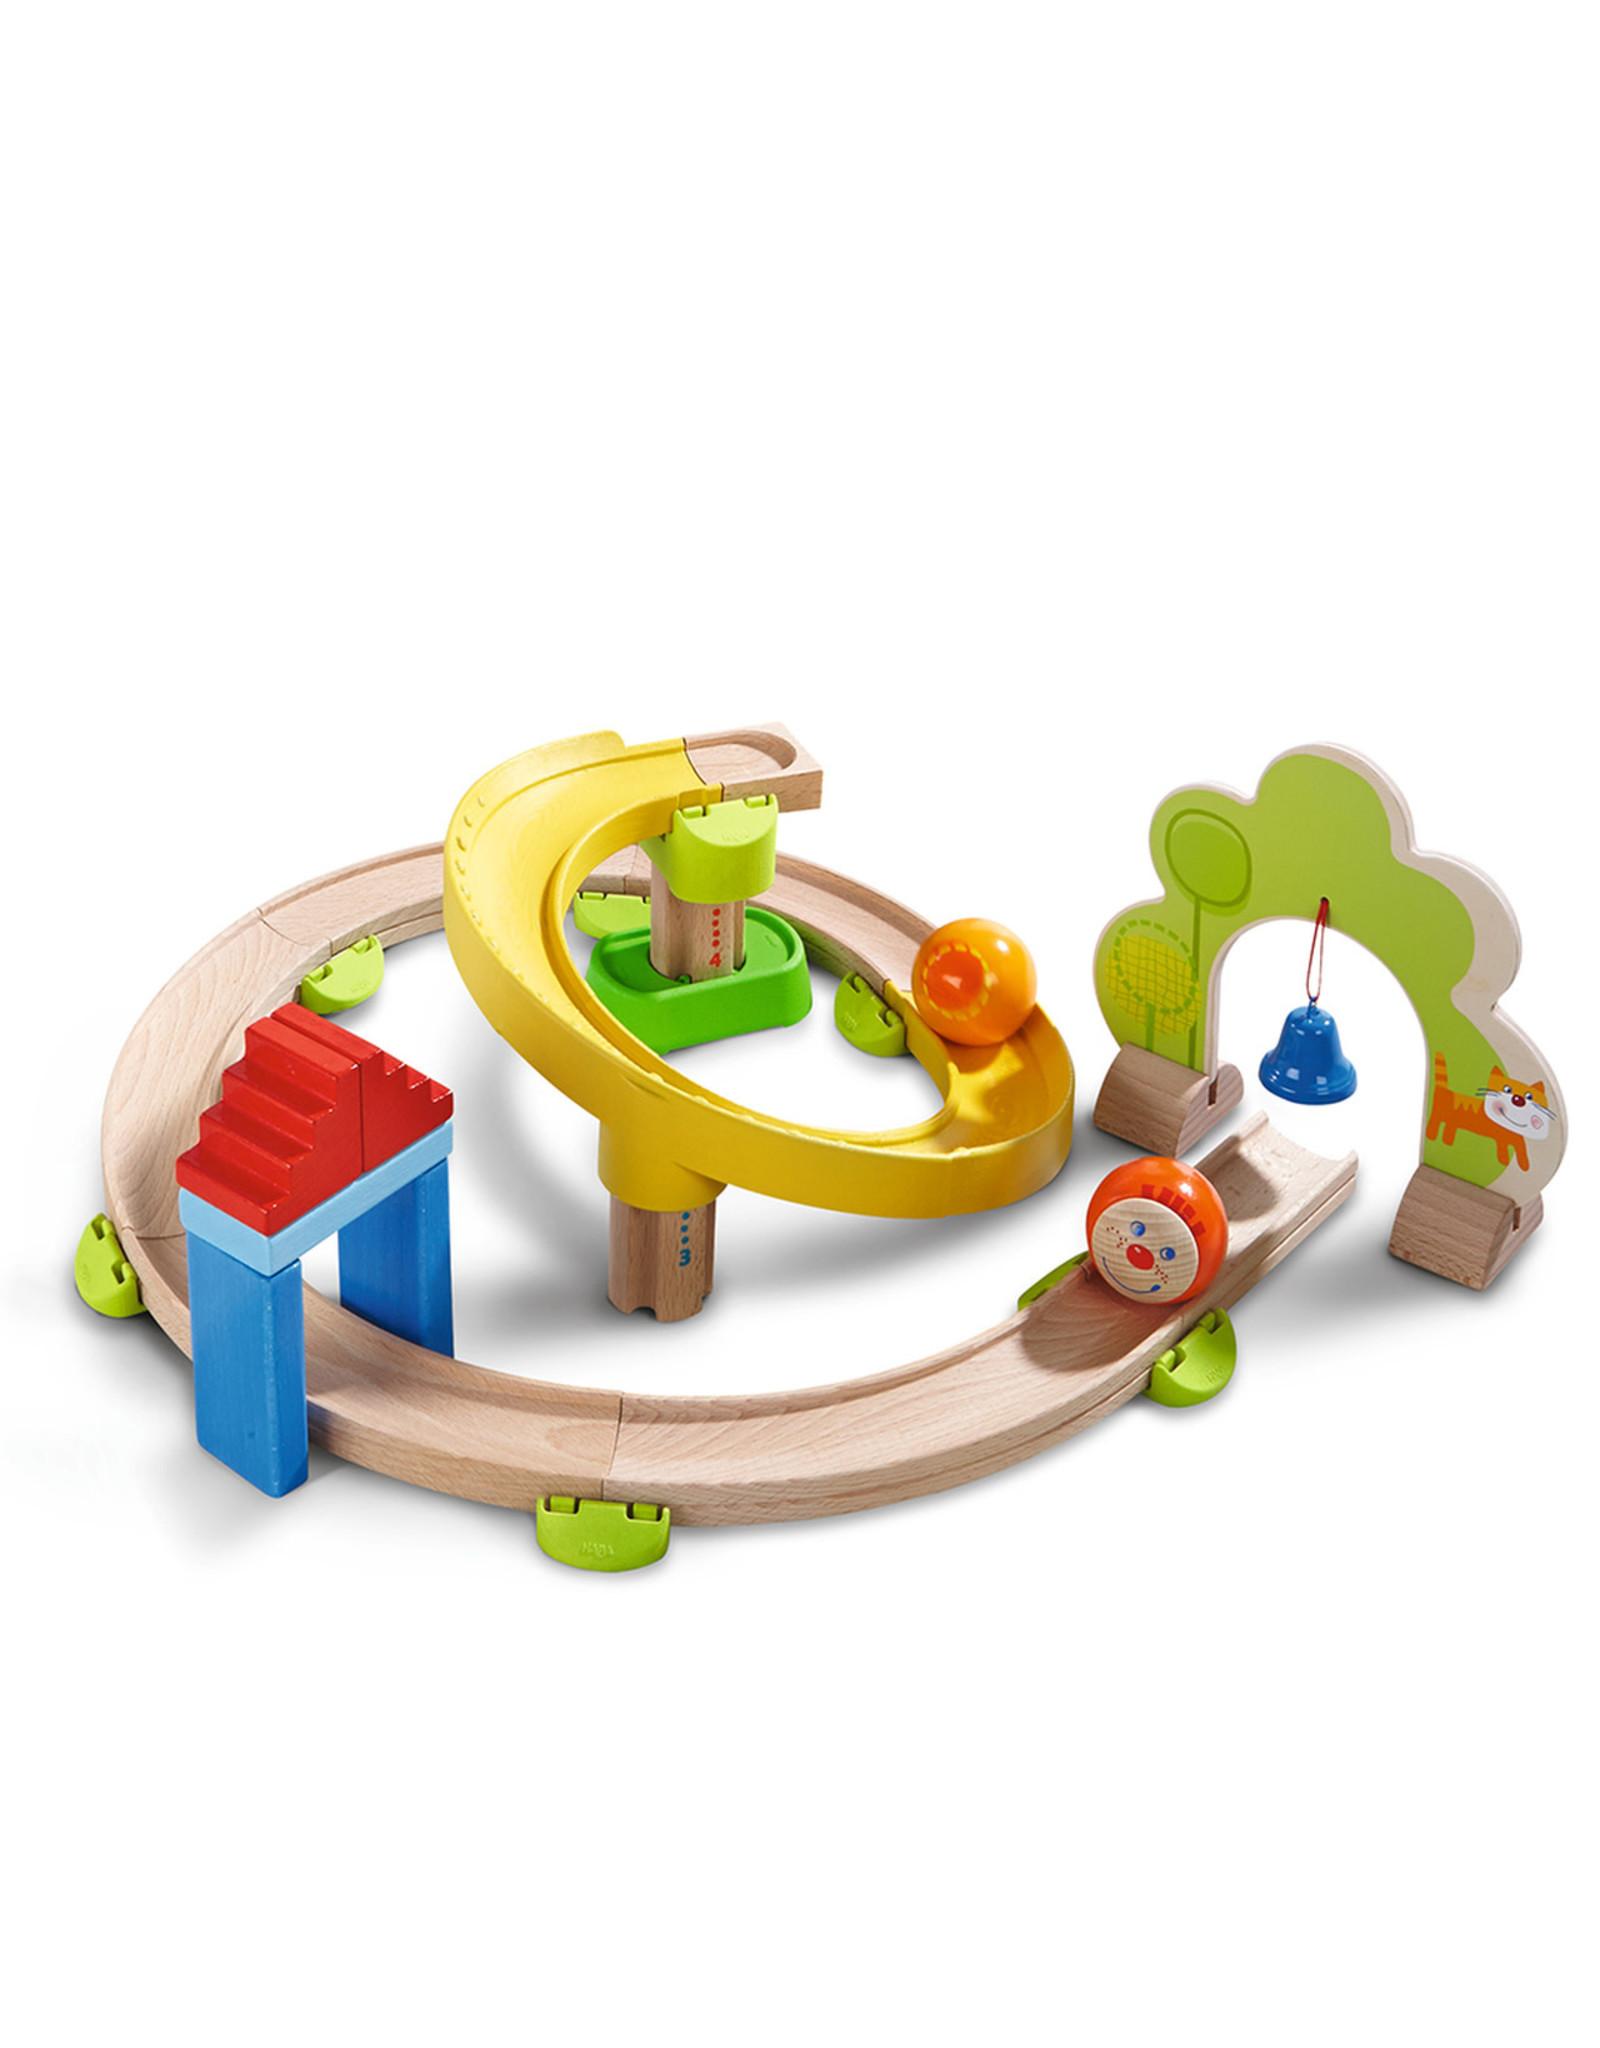 HABA Haba Ball Track Kullerbu - Spiral Track